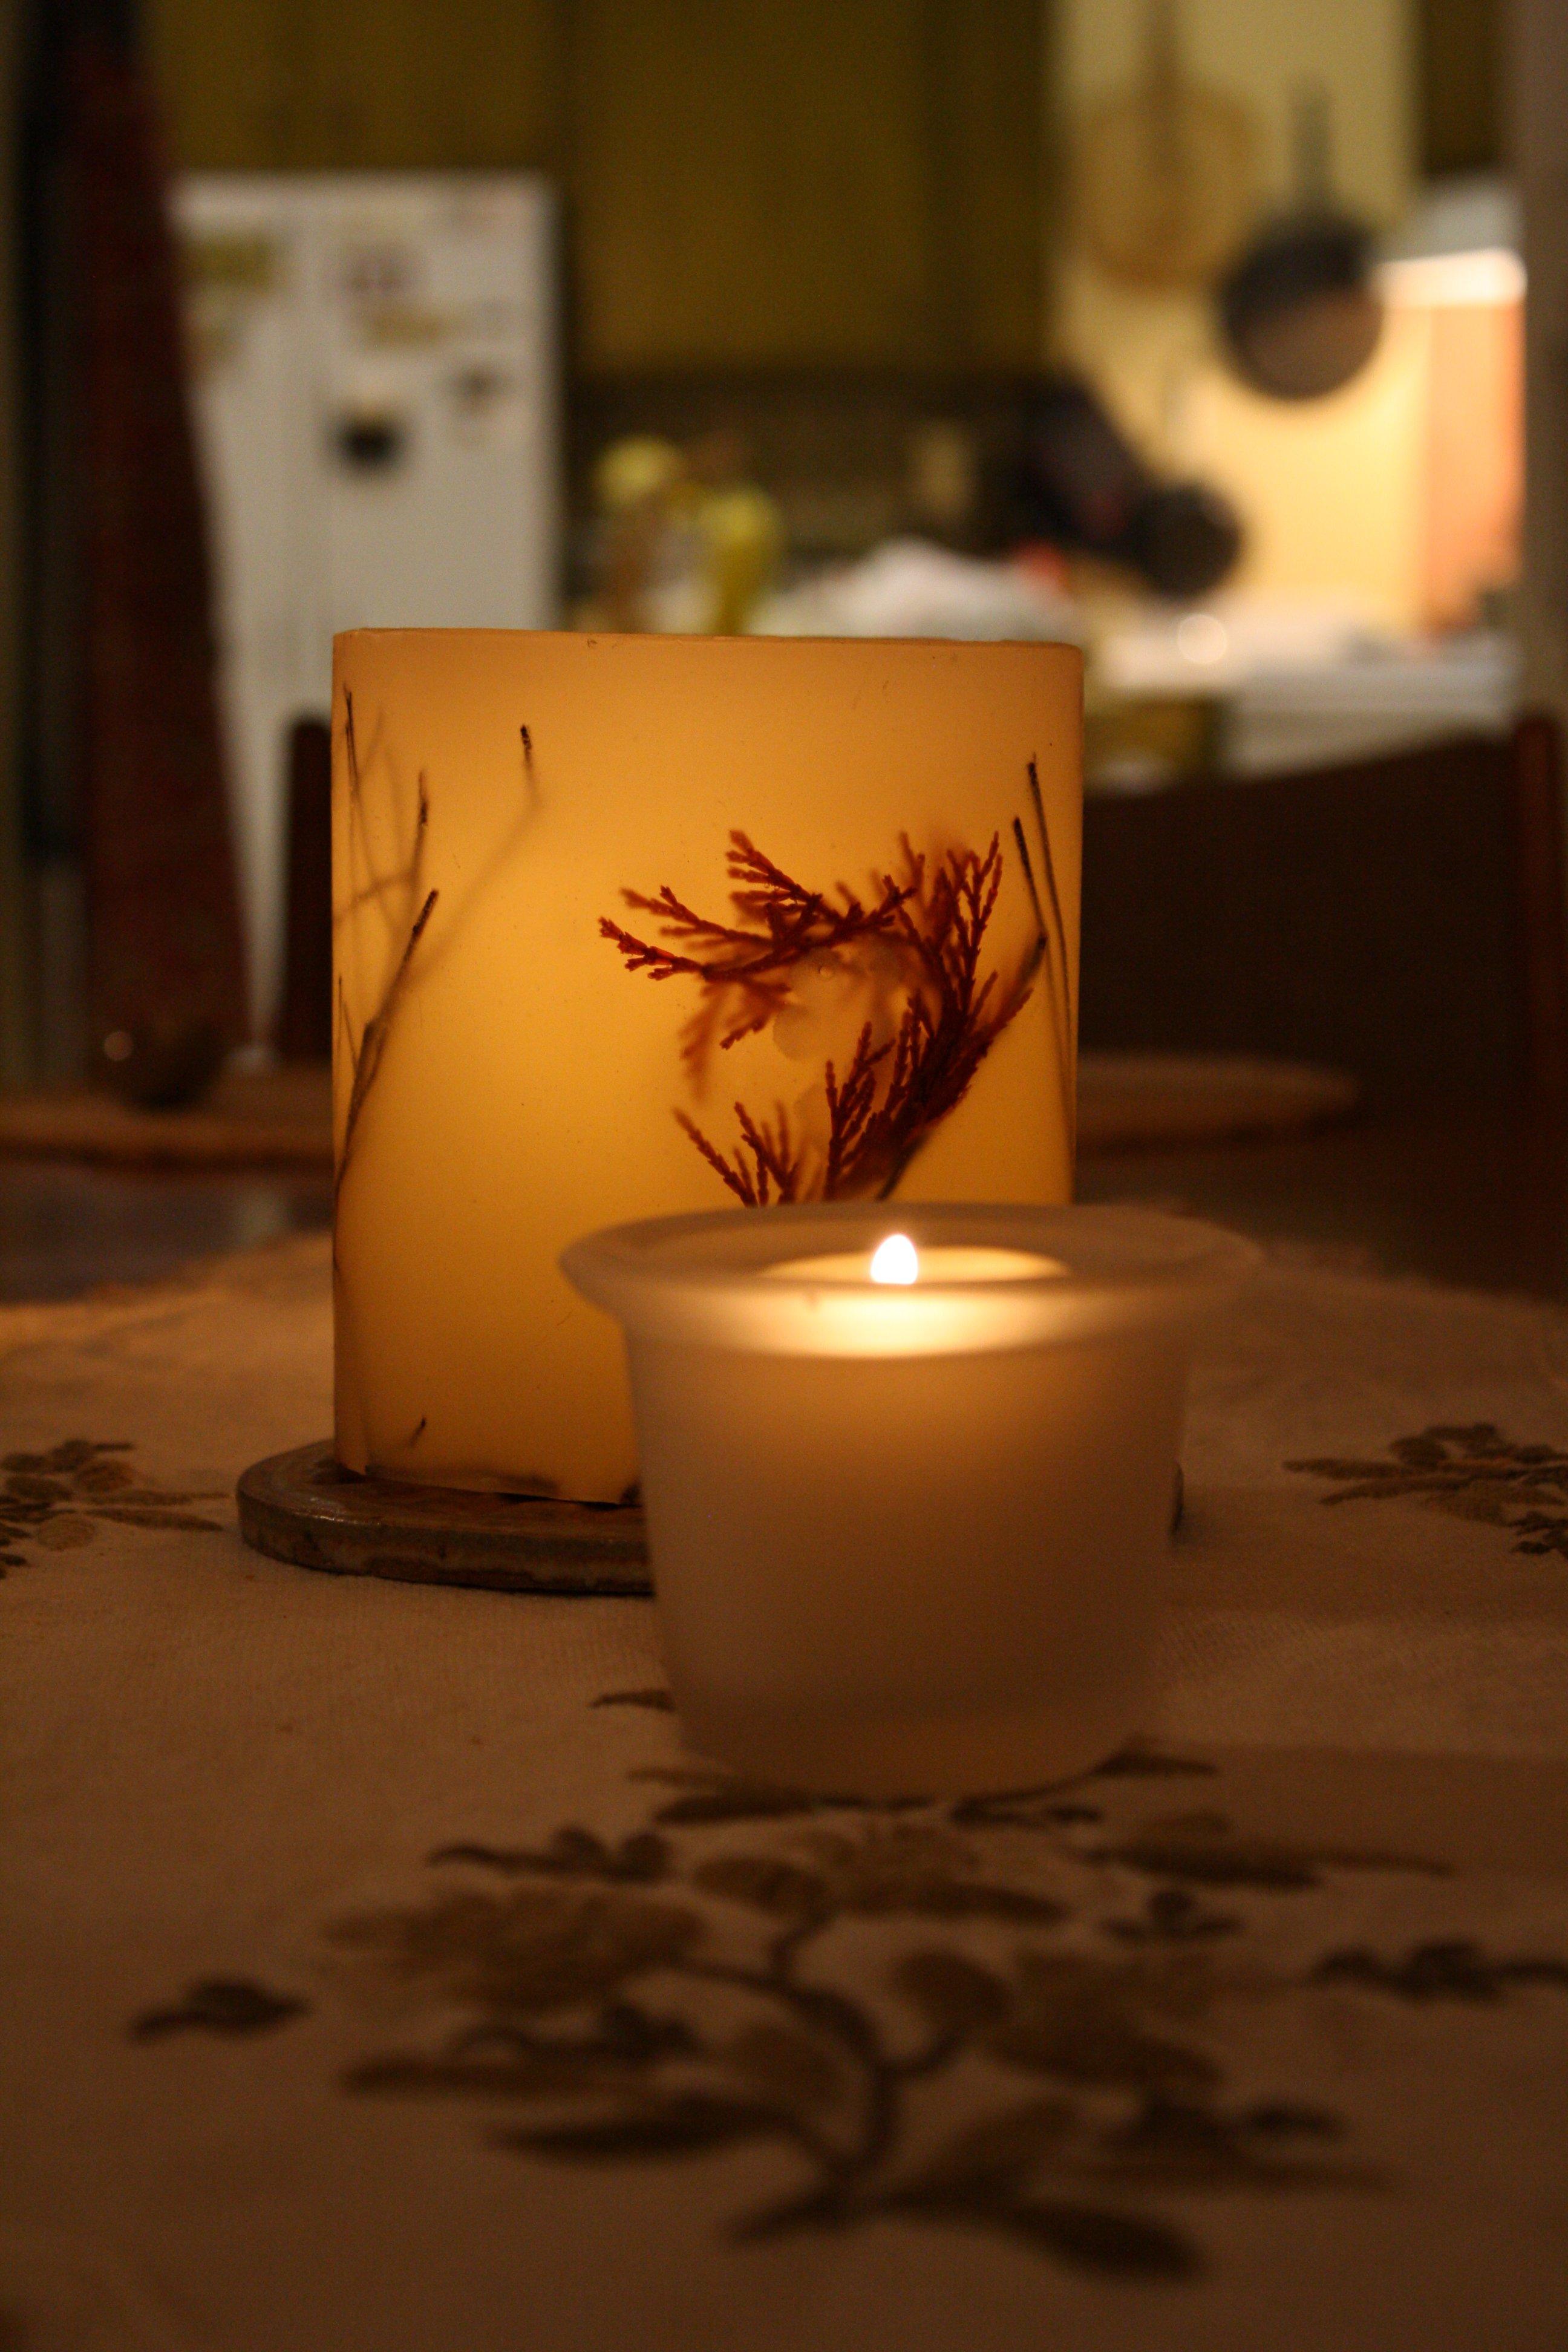 Candles On Dinner Table Photos Public Domain